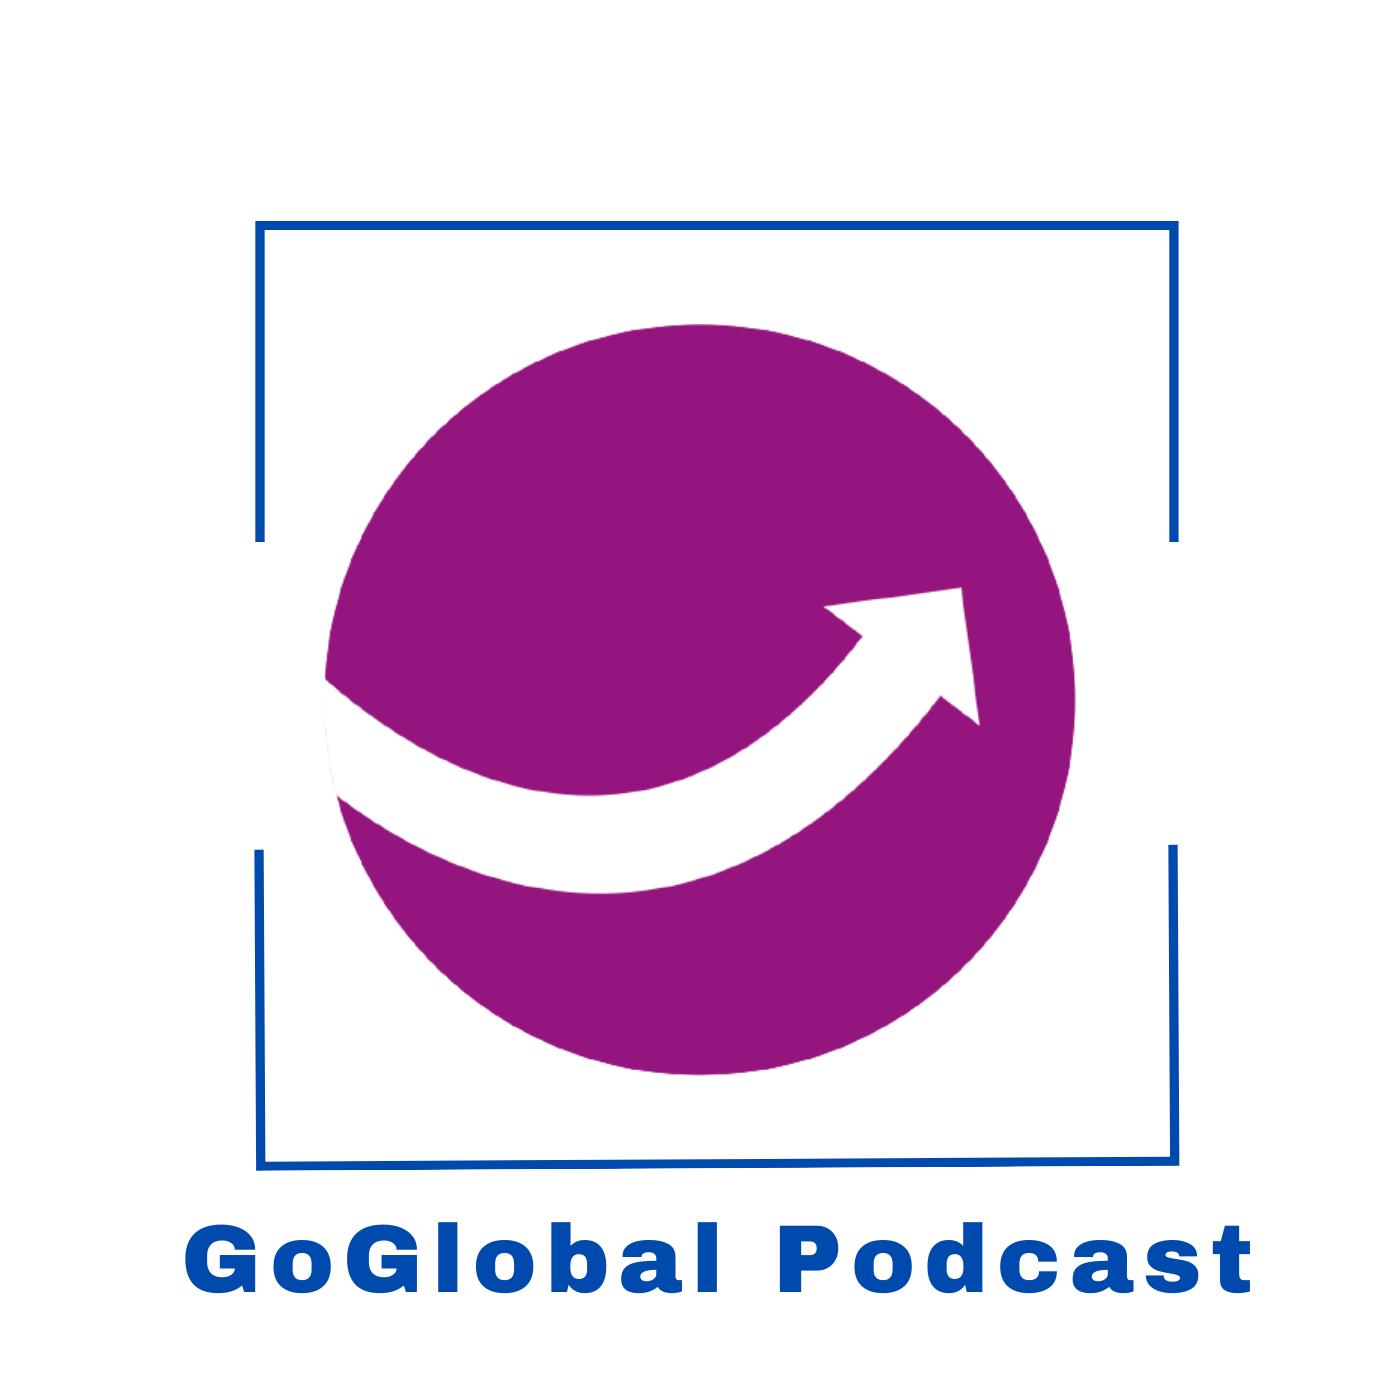 GoGlobal Podcast